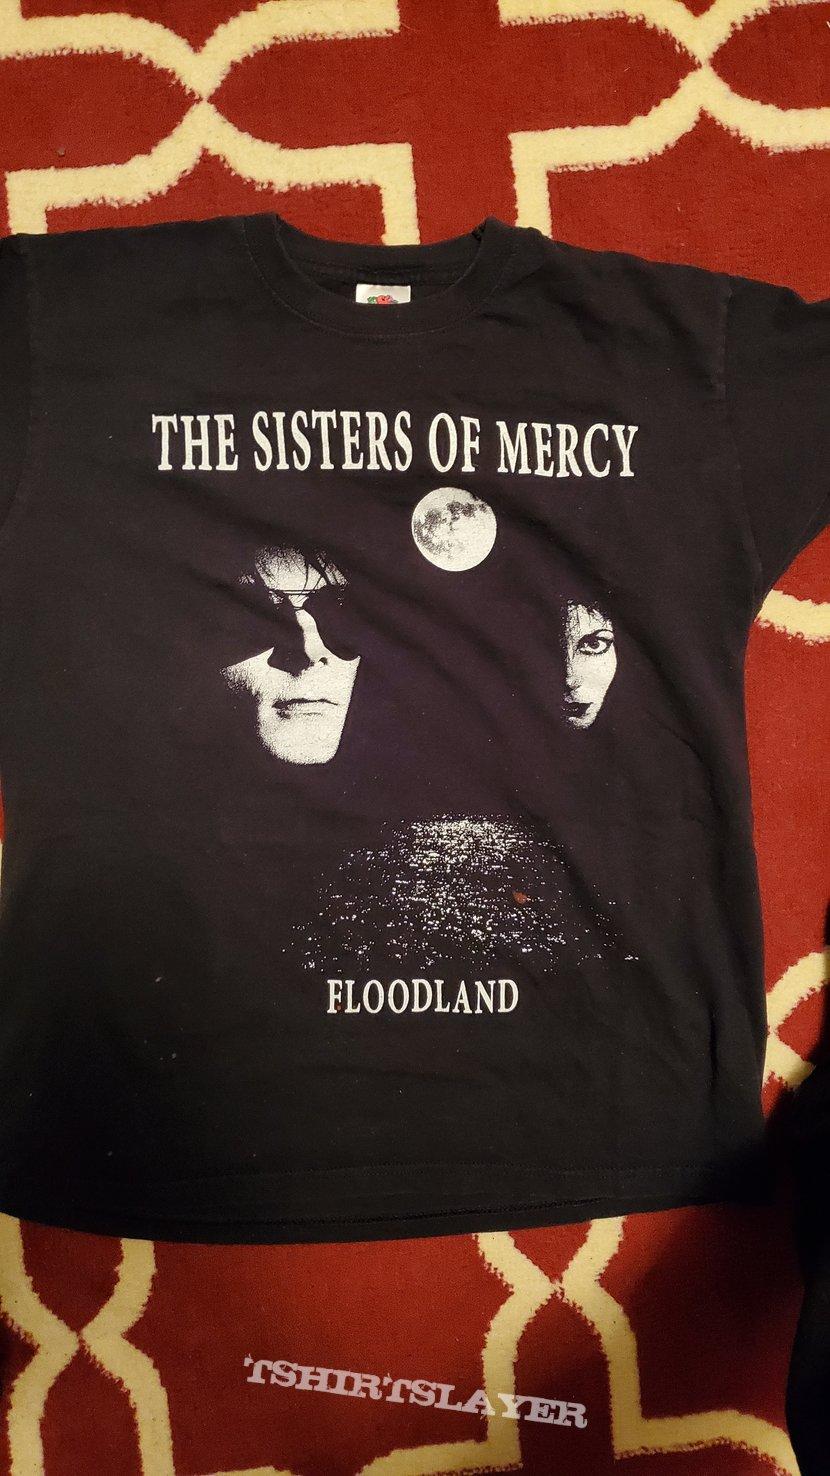 Floodland shirt